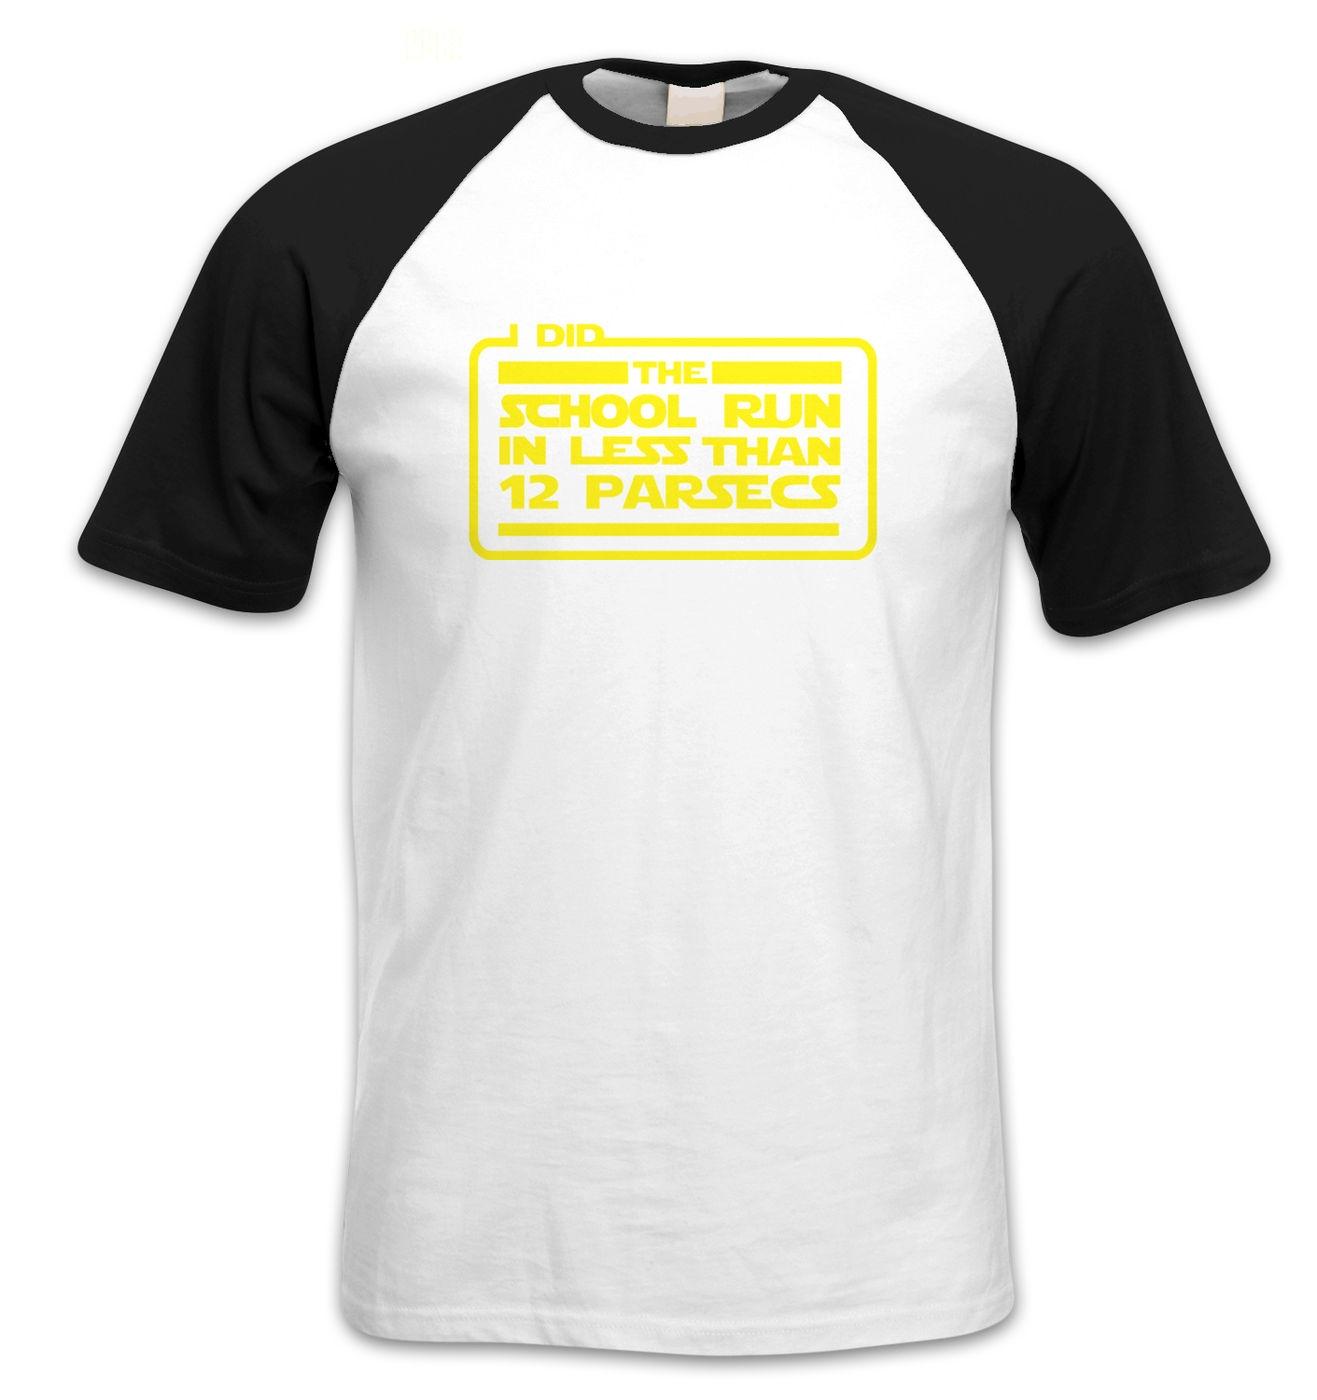 I Did The School Run In 12 Parsecs short-sleeved baseball t-shirt